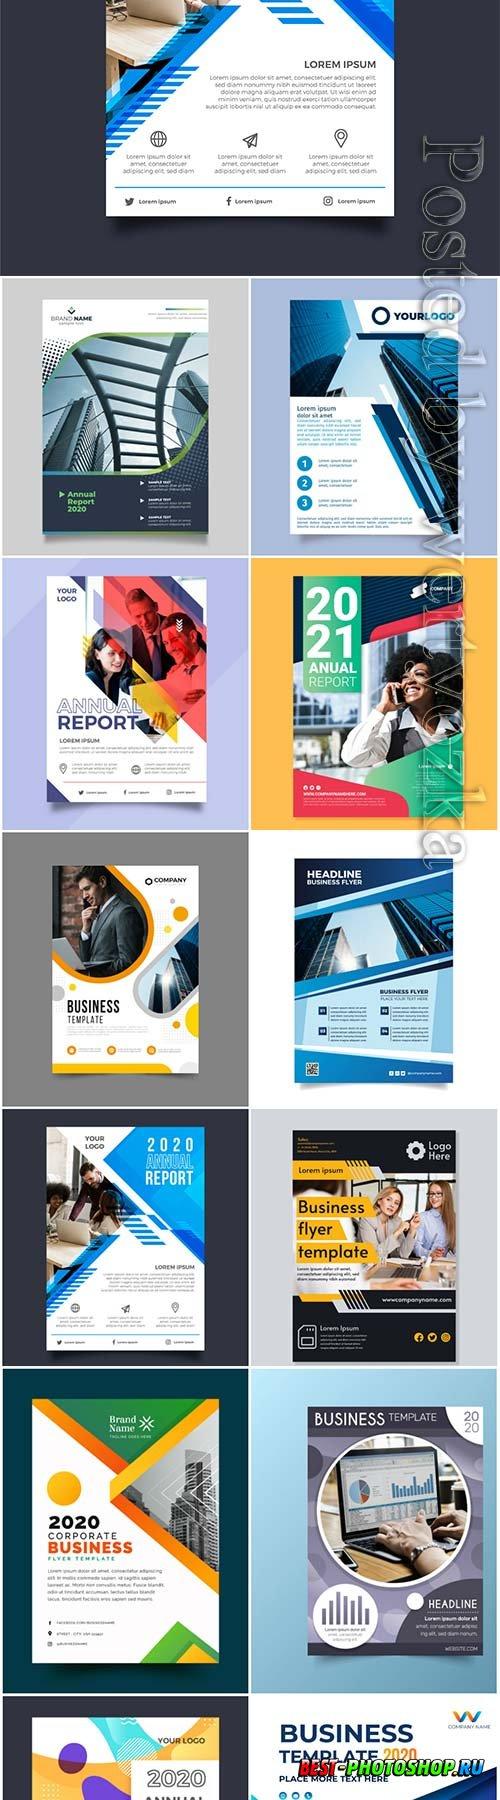 Business flyer concept in vector